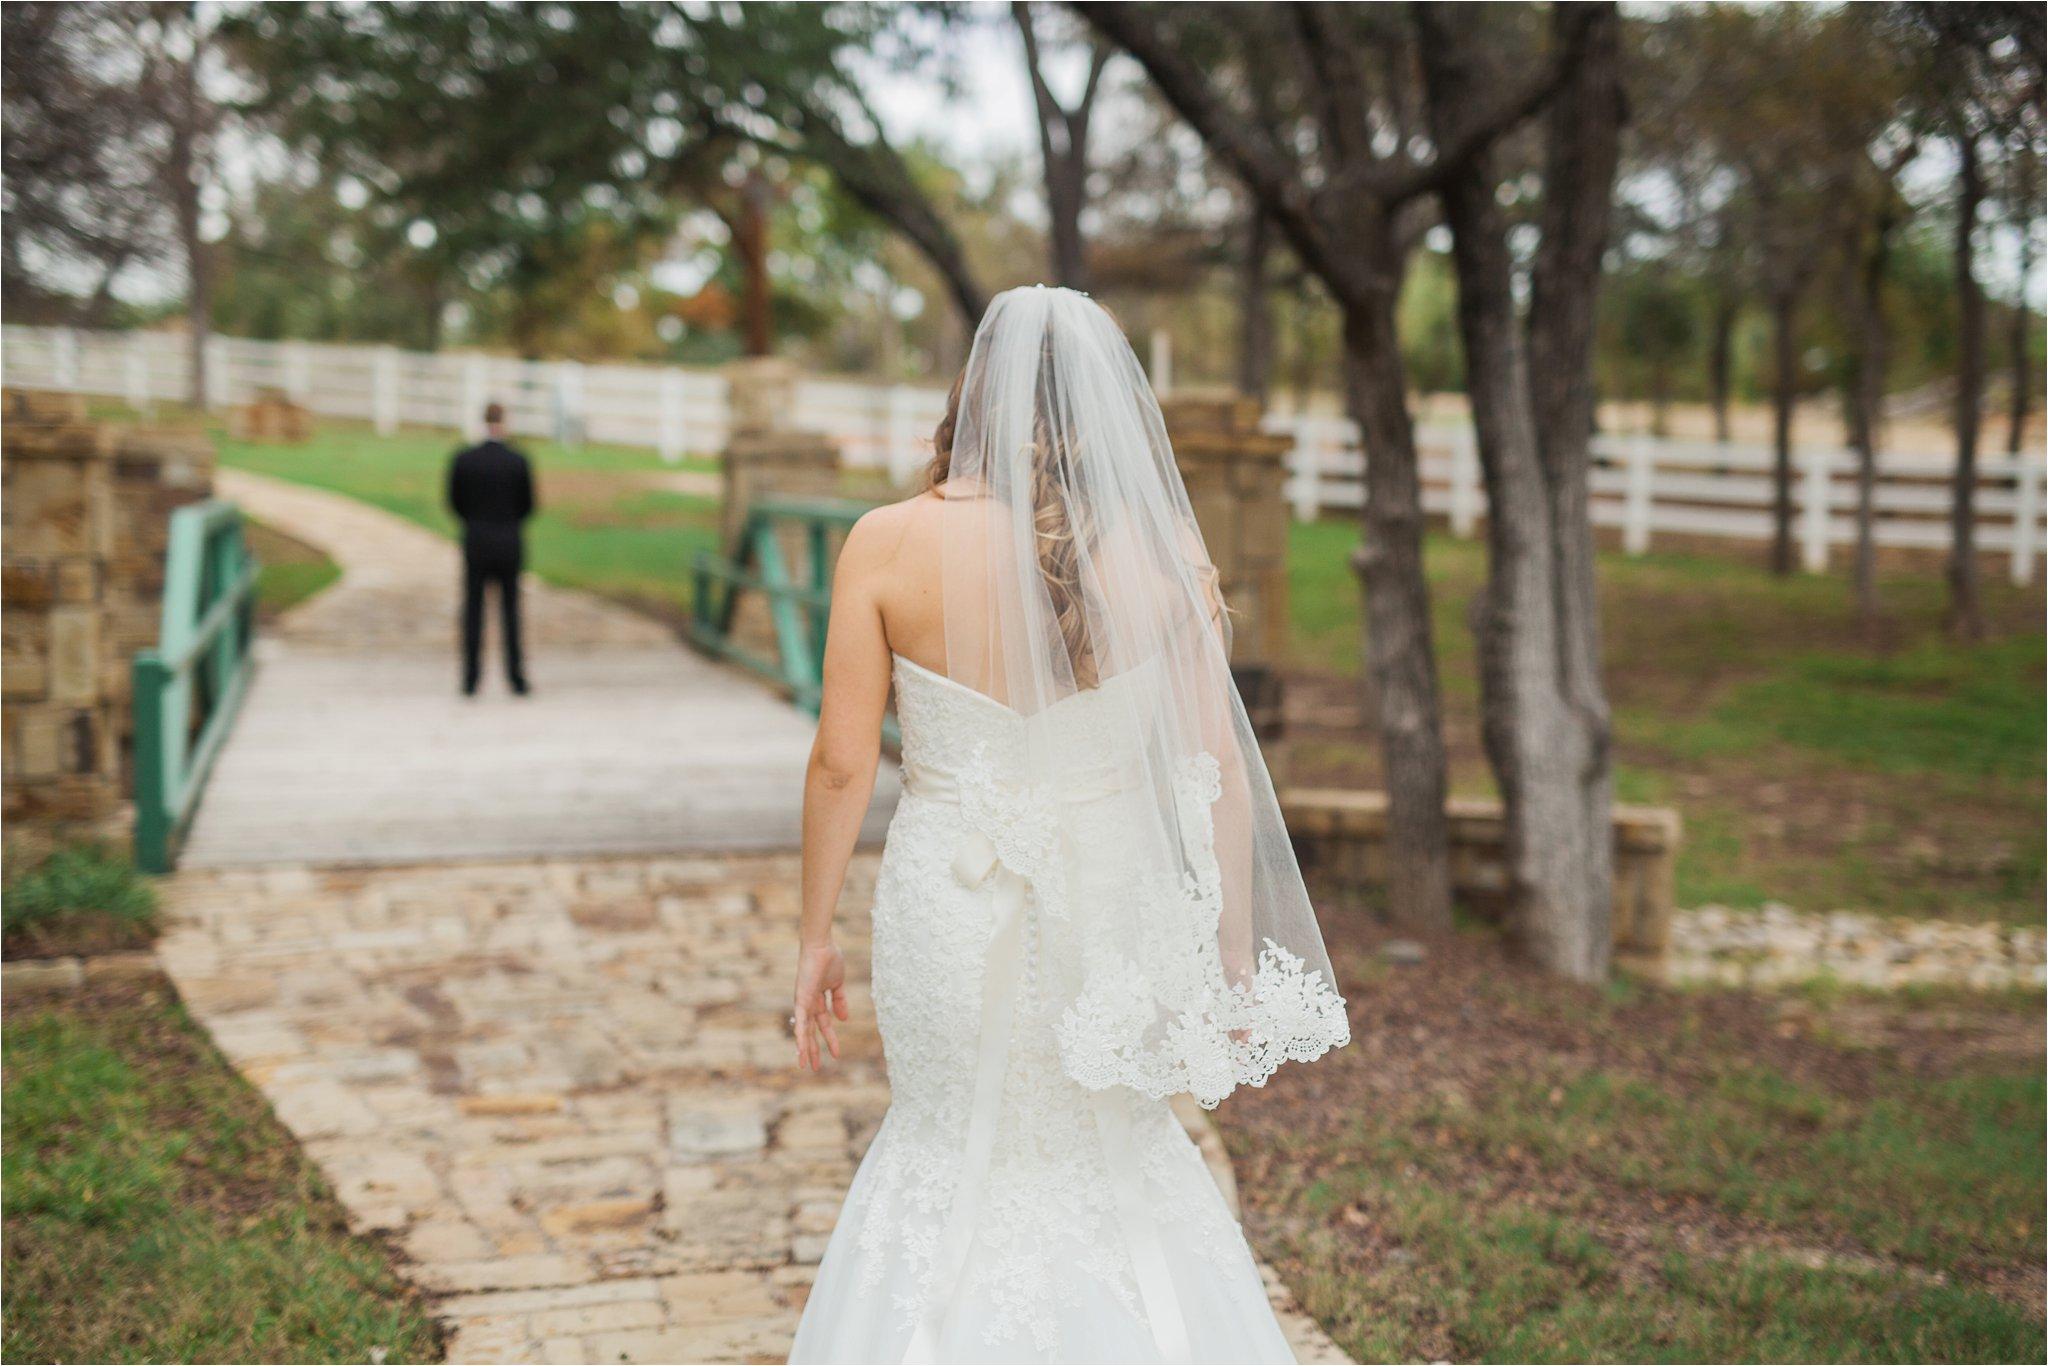 lunsford-wedding-101.jpg